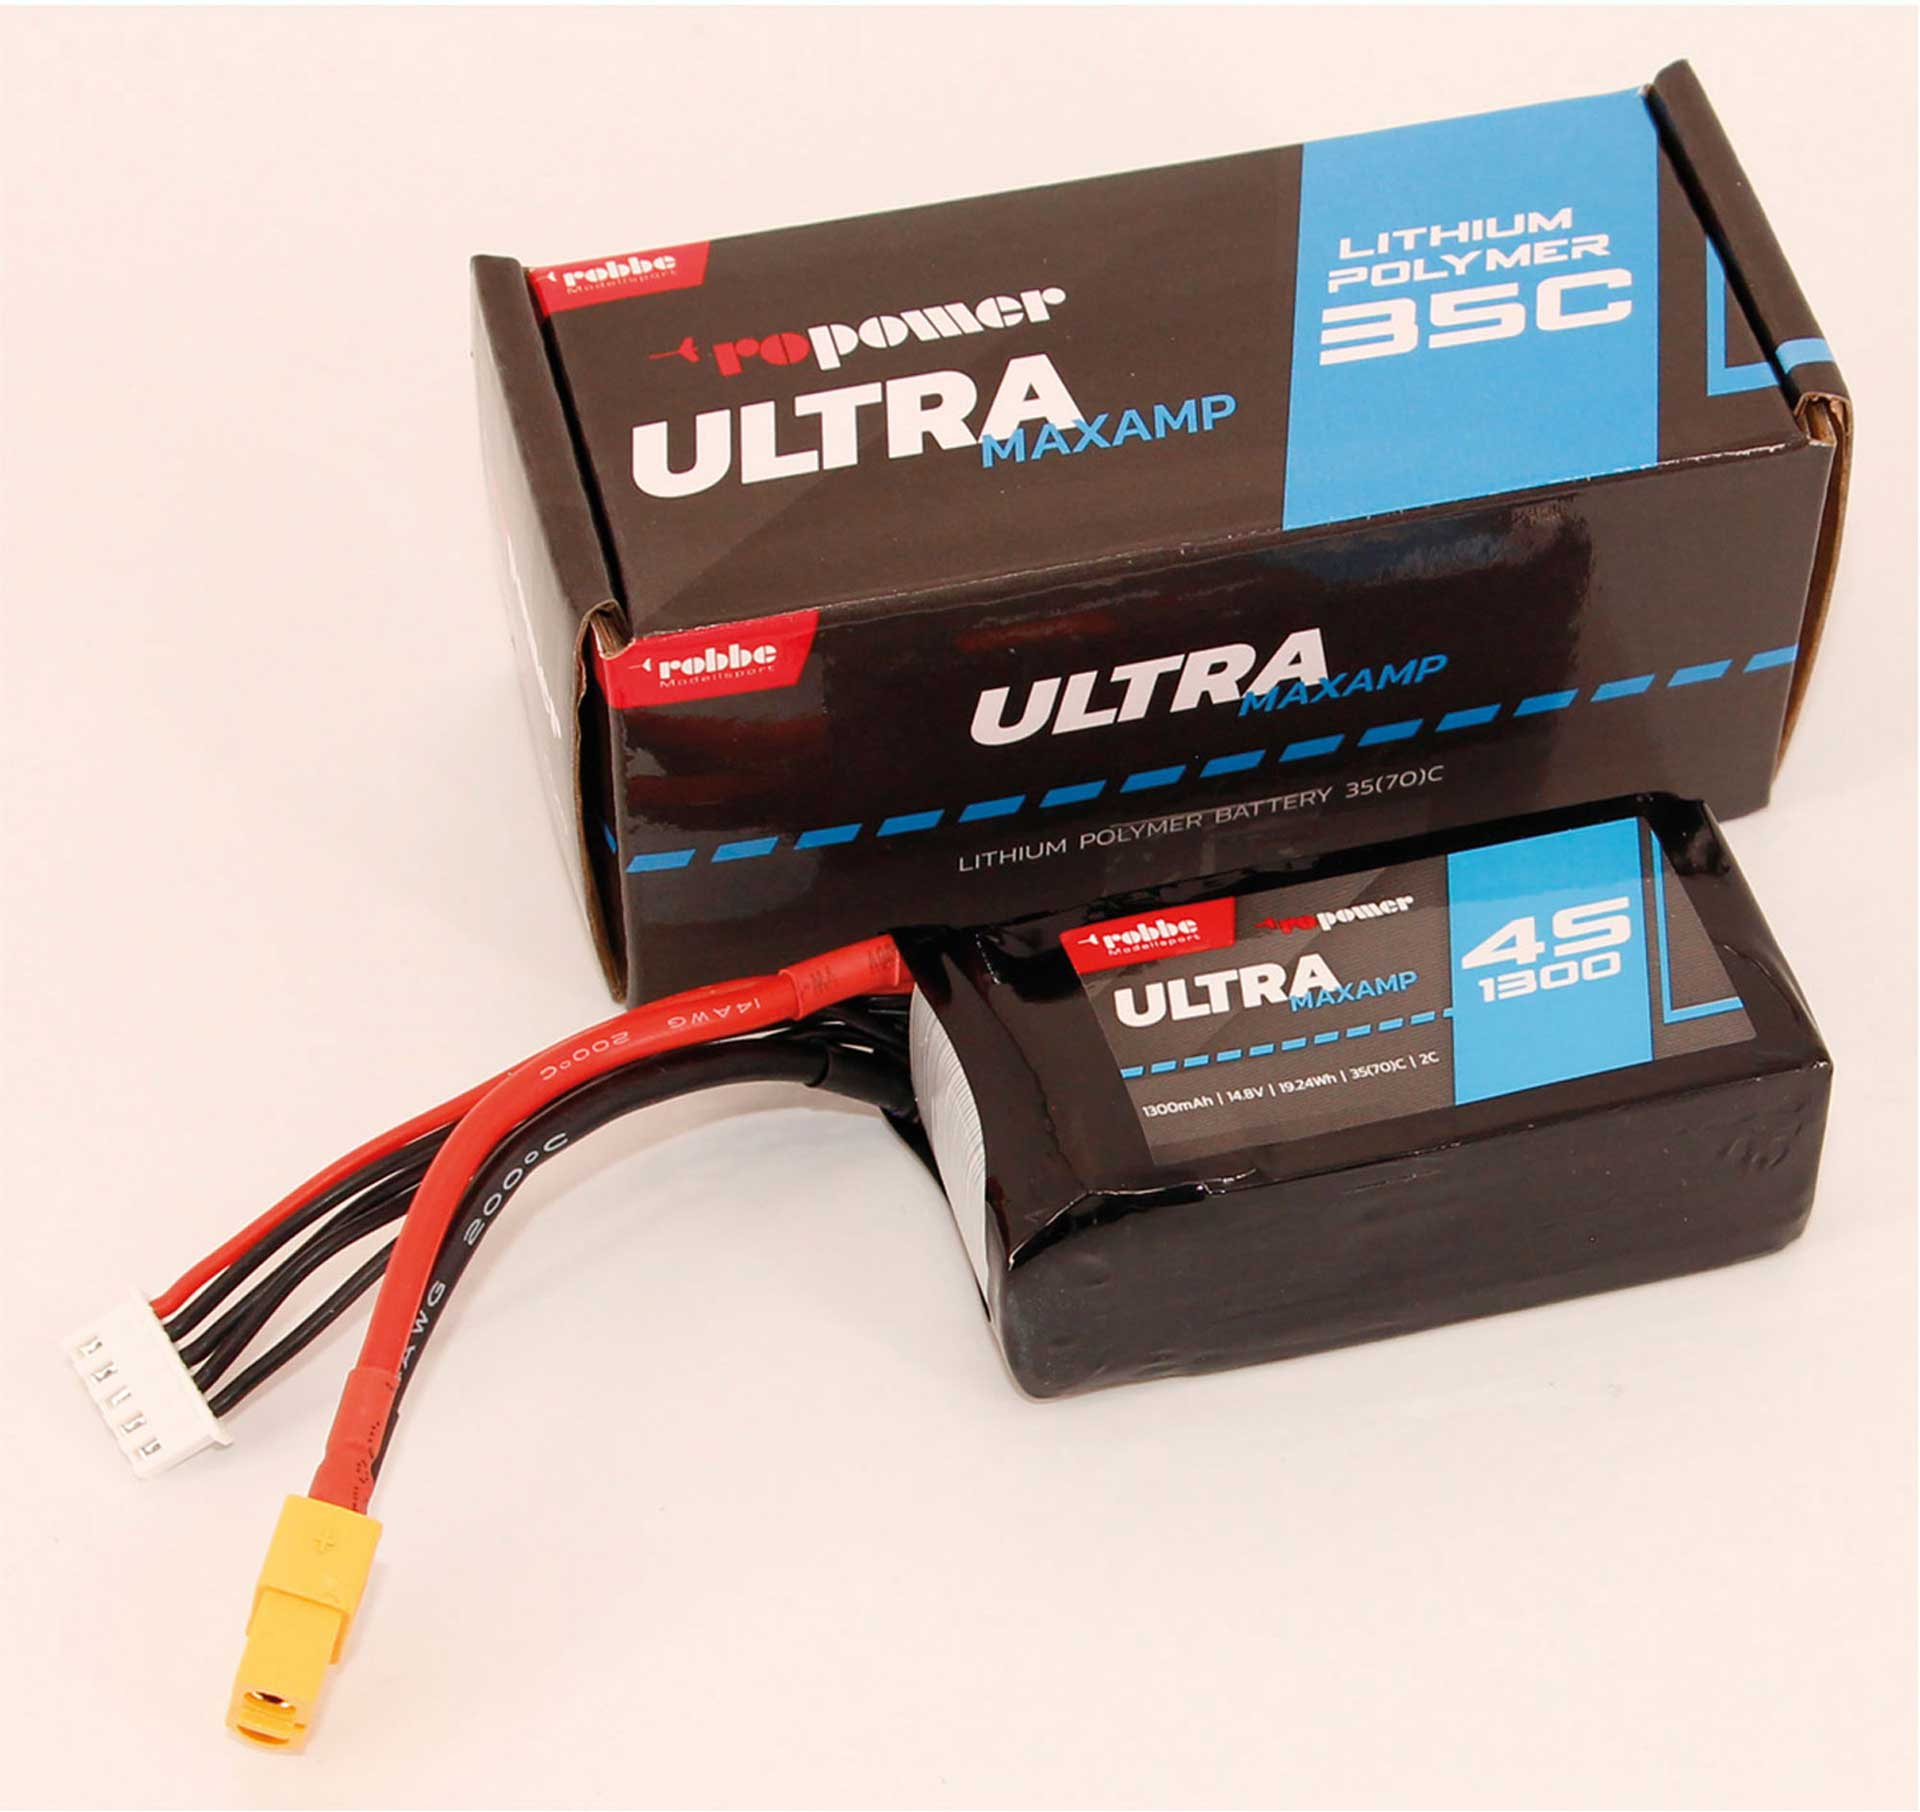 Robbe Modellsport RO-POWER ULTRA MAXAMP 1300MAH 14,8 VOLT 4S 35(70)C LIPO AKKU